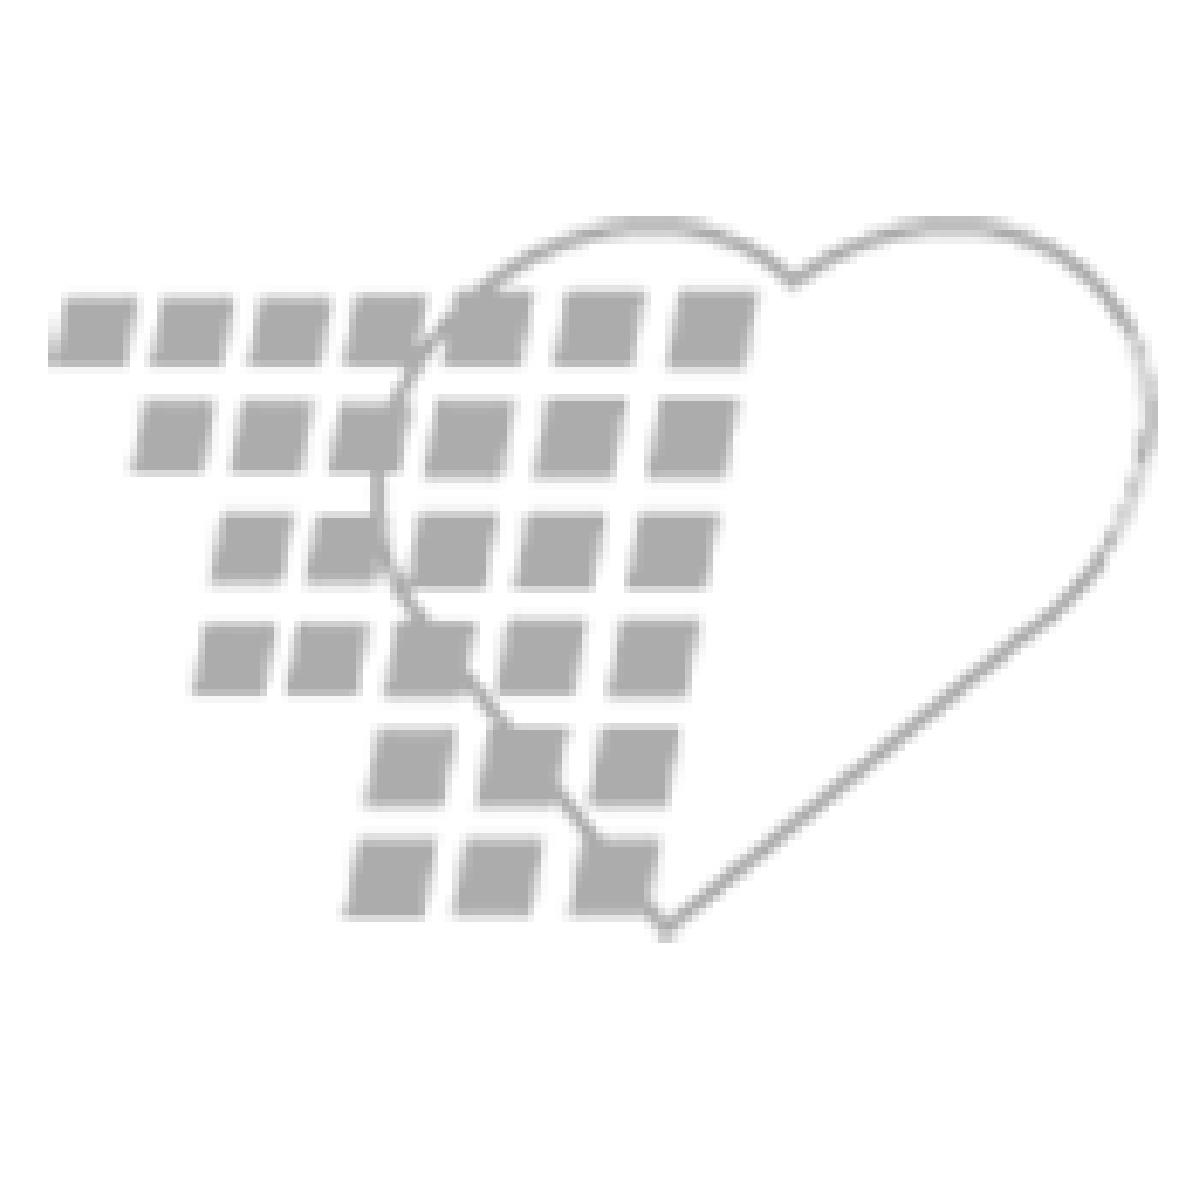 10-81-3263 Case for Disarticulated Skeleton